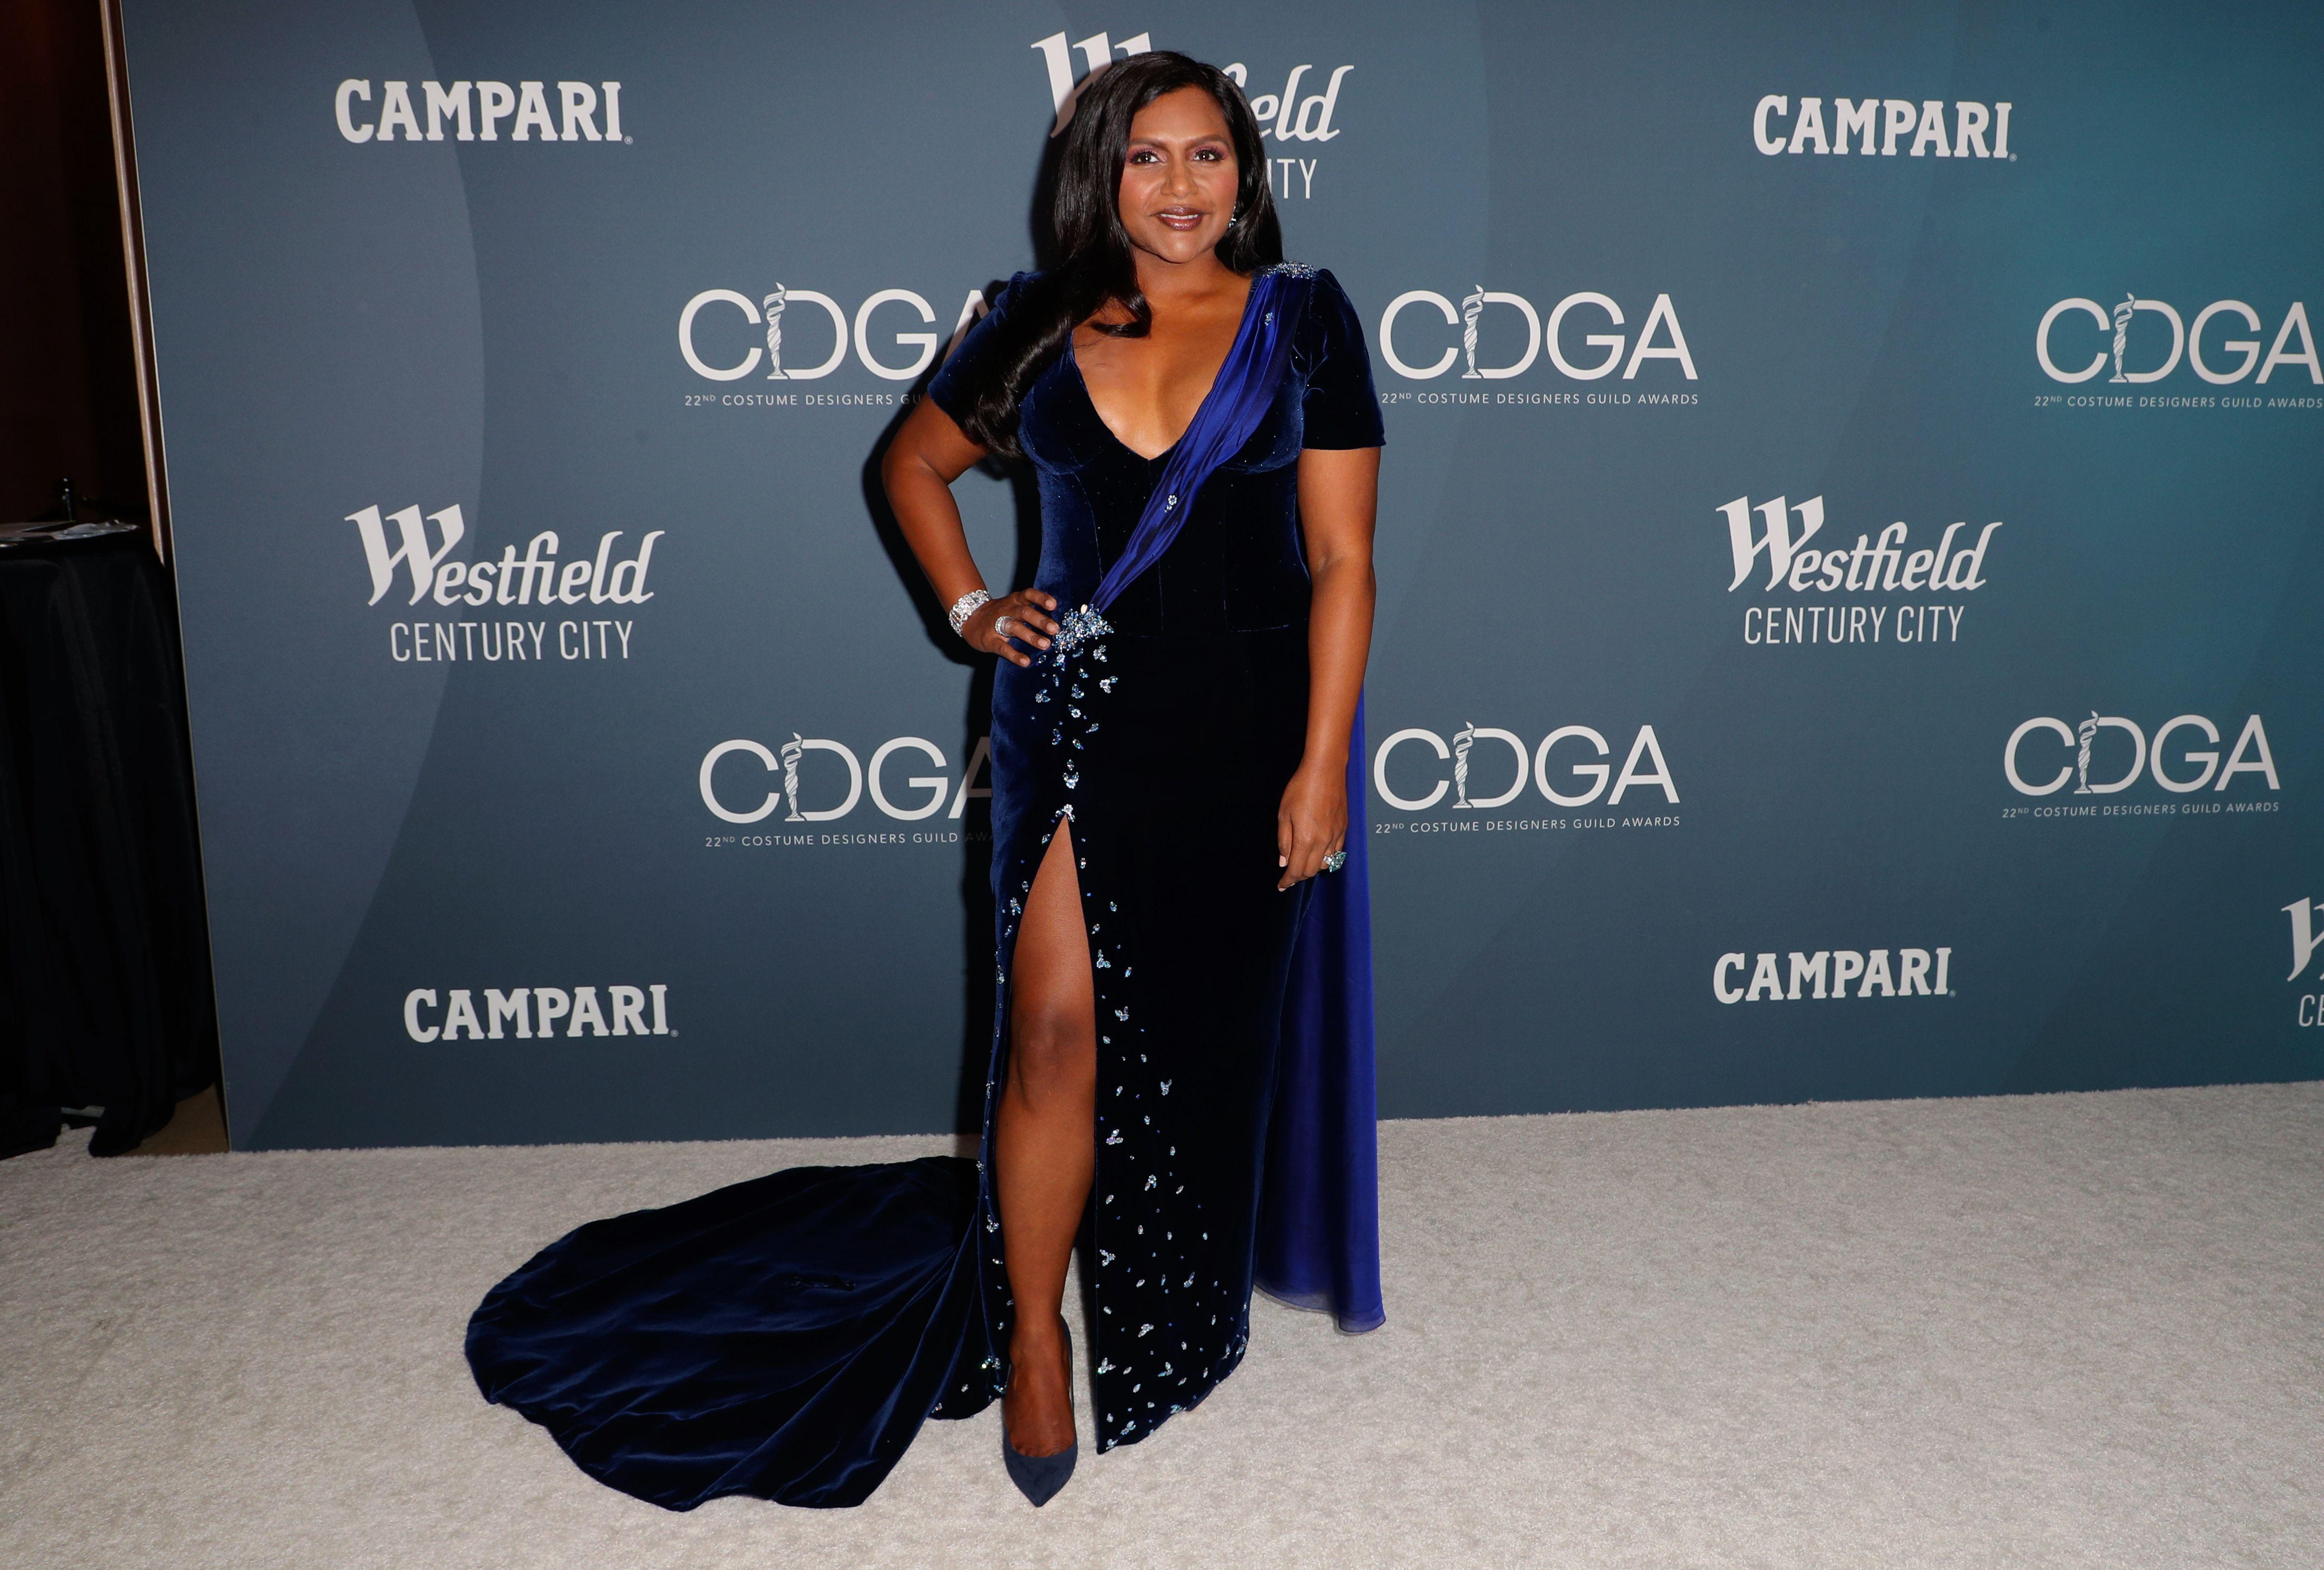 Mindy Kaling22nd Costume Designers Guild Awards, Arrivals, The Beverly Hilton, Los Angeles, USA - 28 Jan 2020 Wearing Salvador Perez, Custom